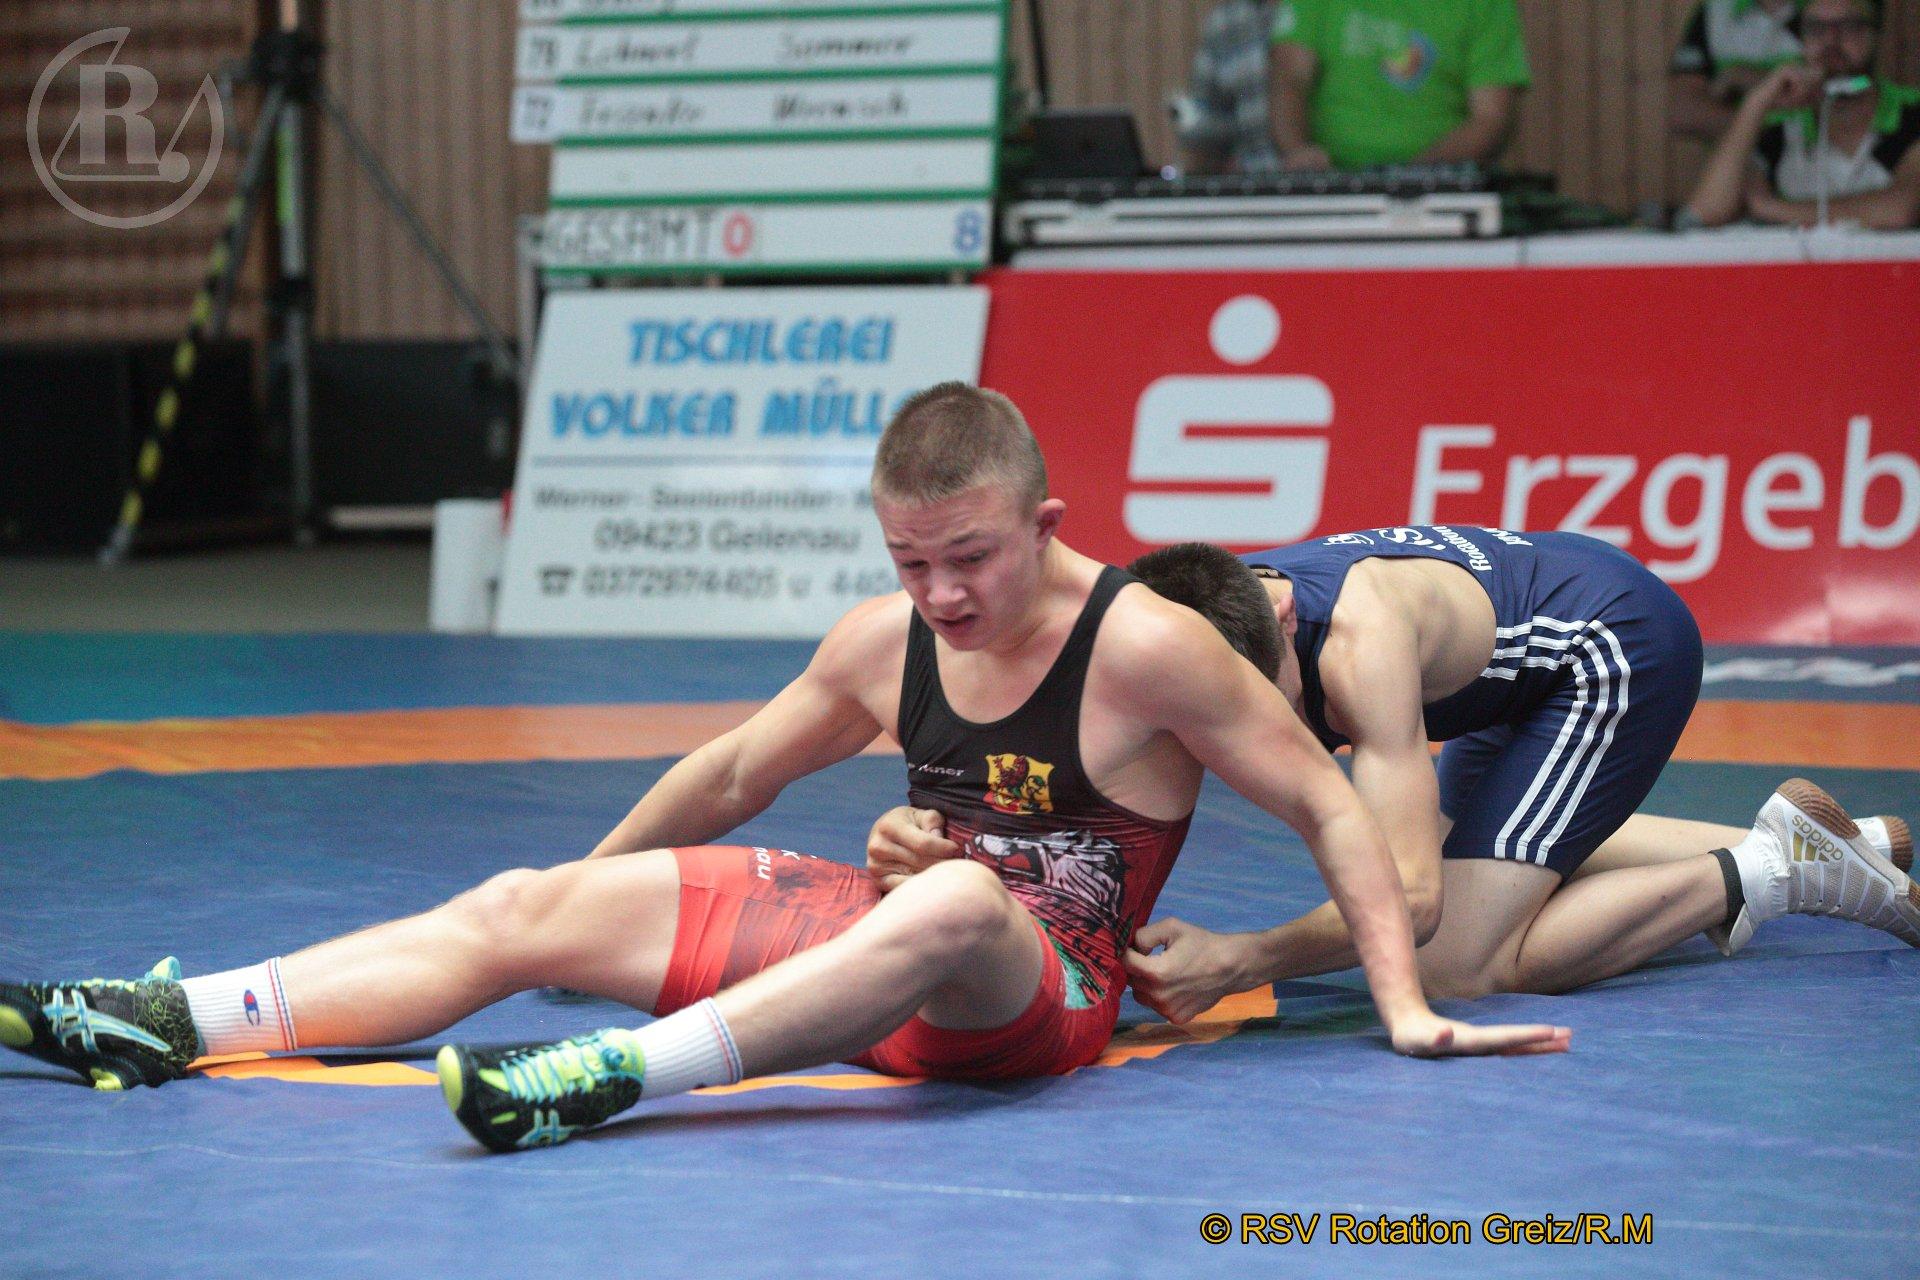 57 kg Greco: Schmalfuß, William, WKG Gelenau II/Chemnitz gegen Hanke, Lucas (blaues Trikot), RSV Rotation Greiz II - 4:0/UG/8:3/02:30